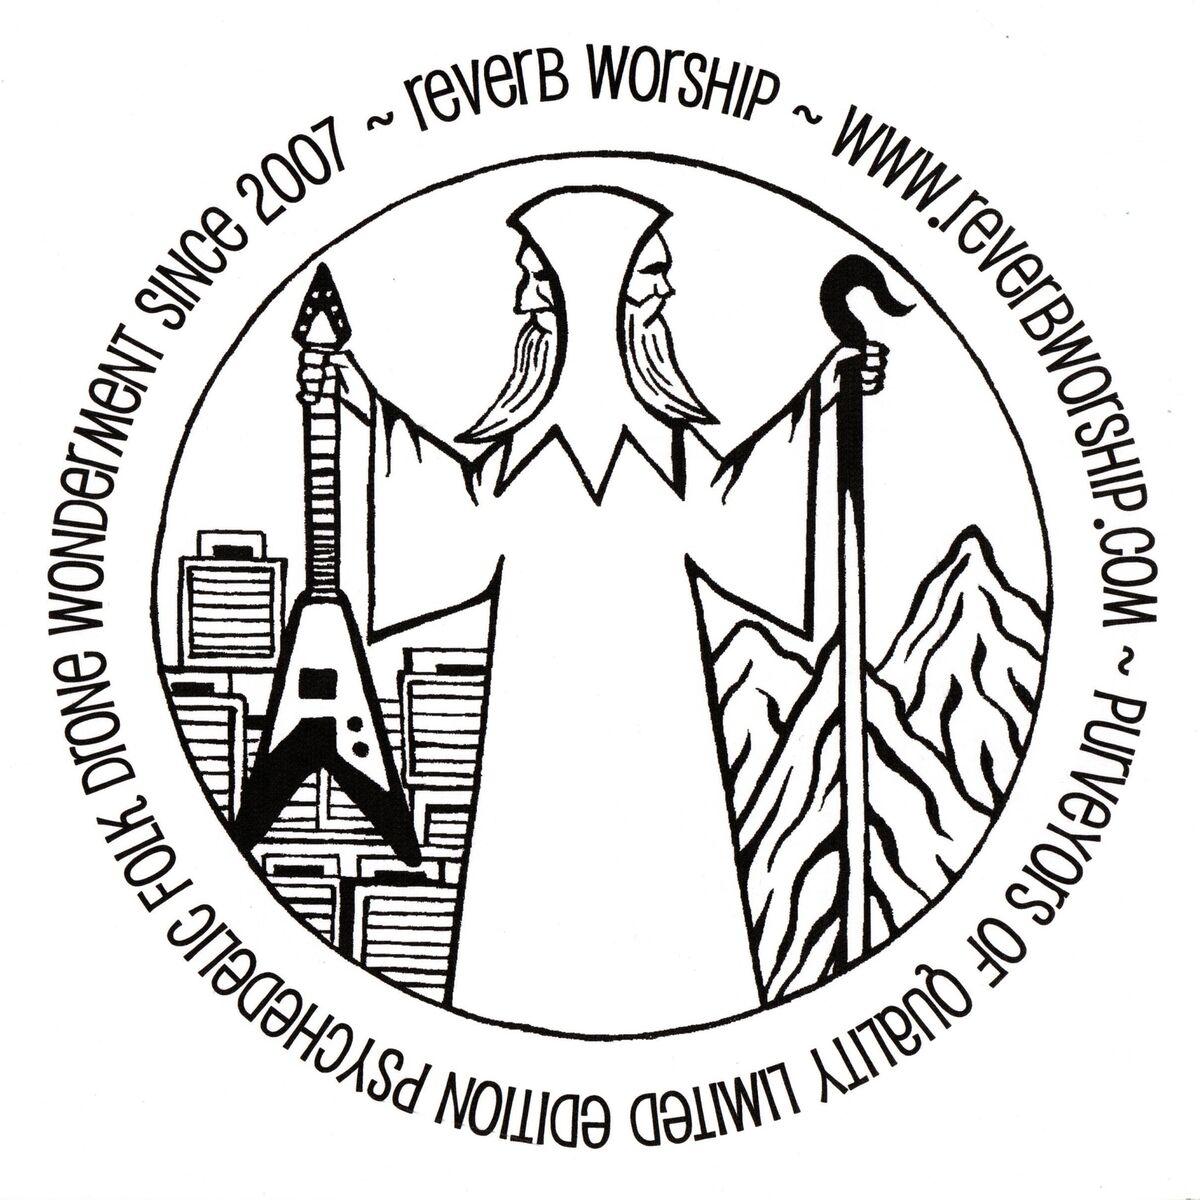 reverbworship